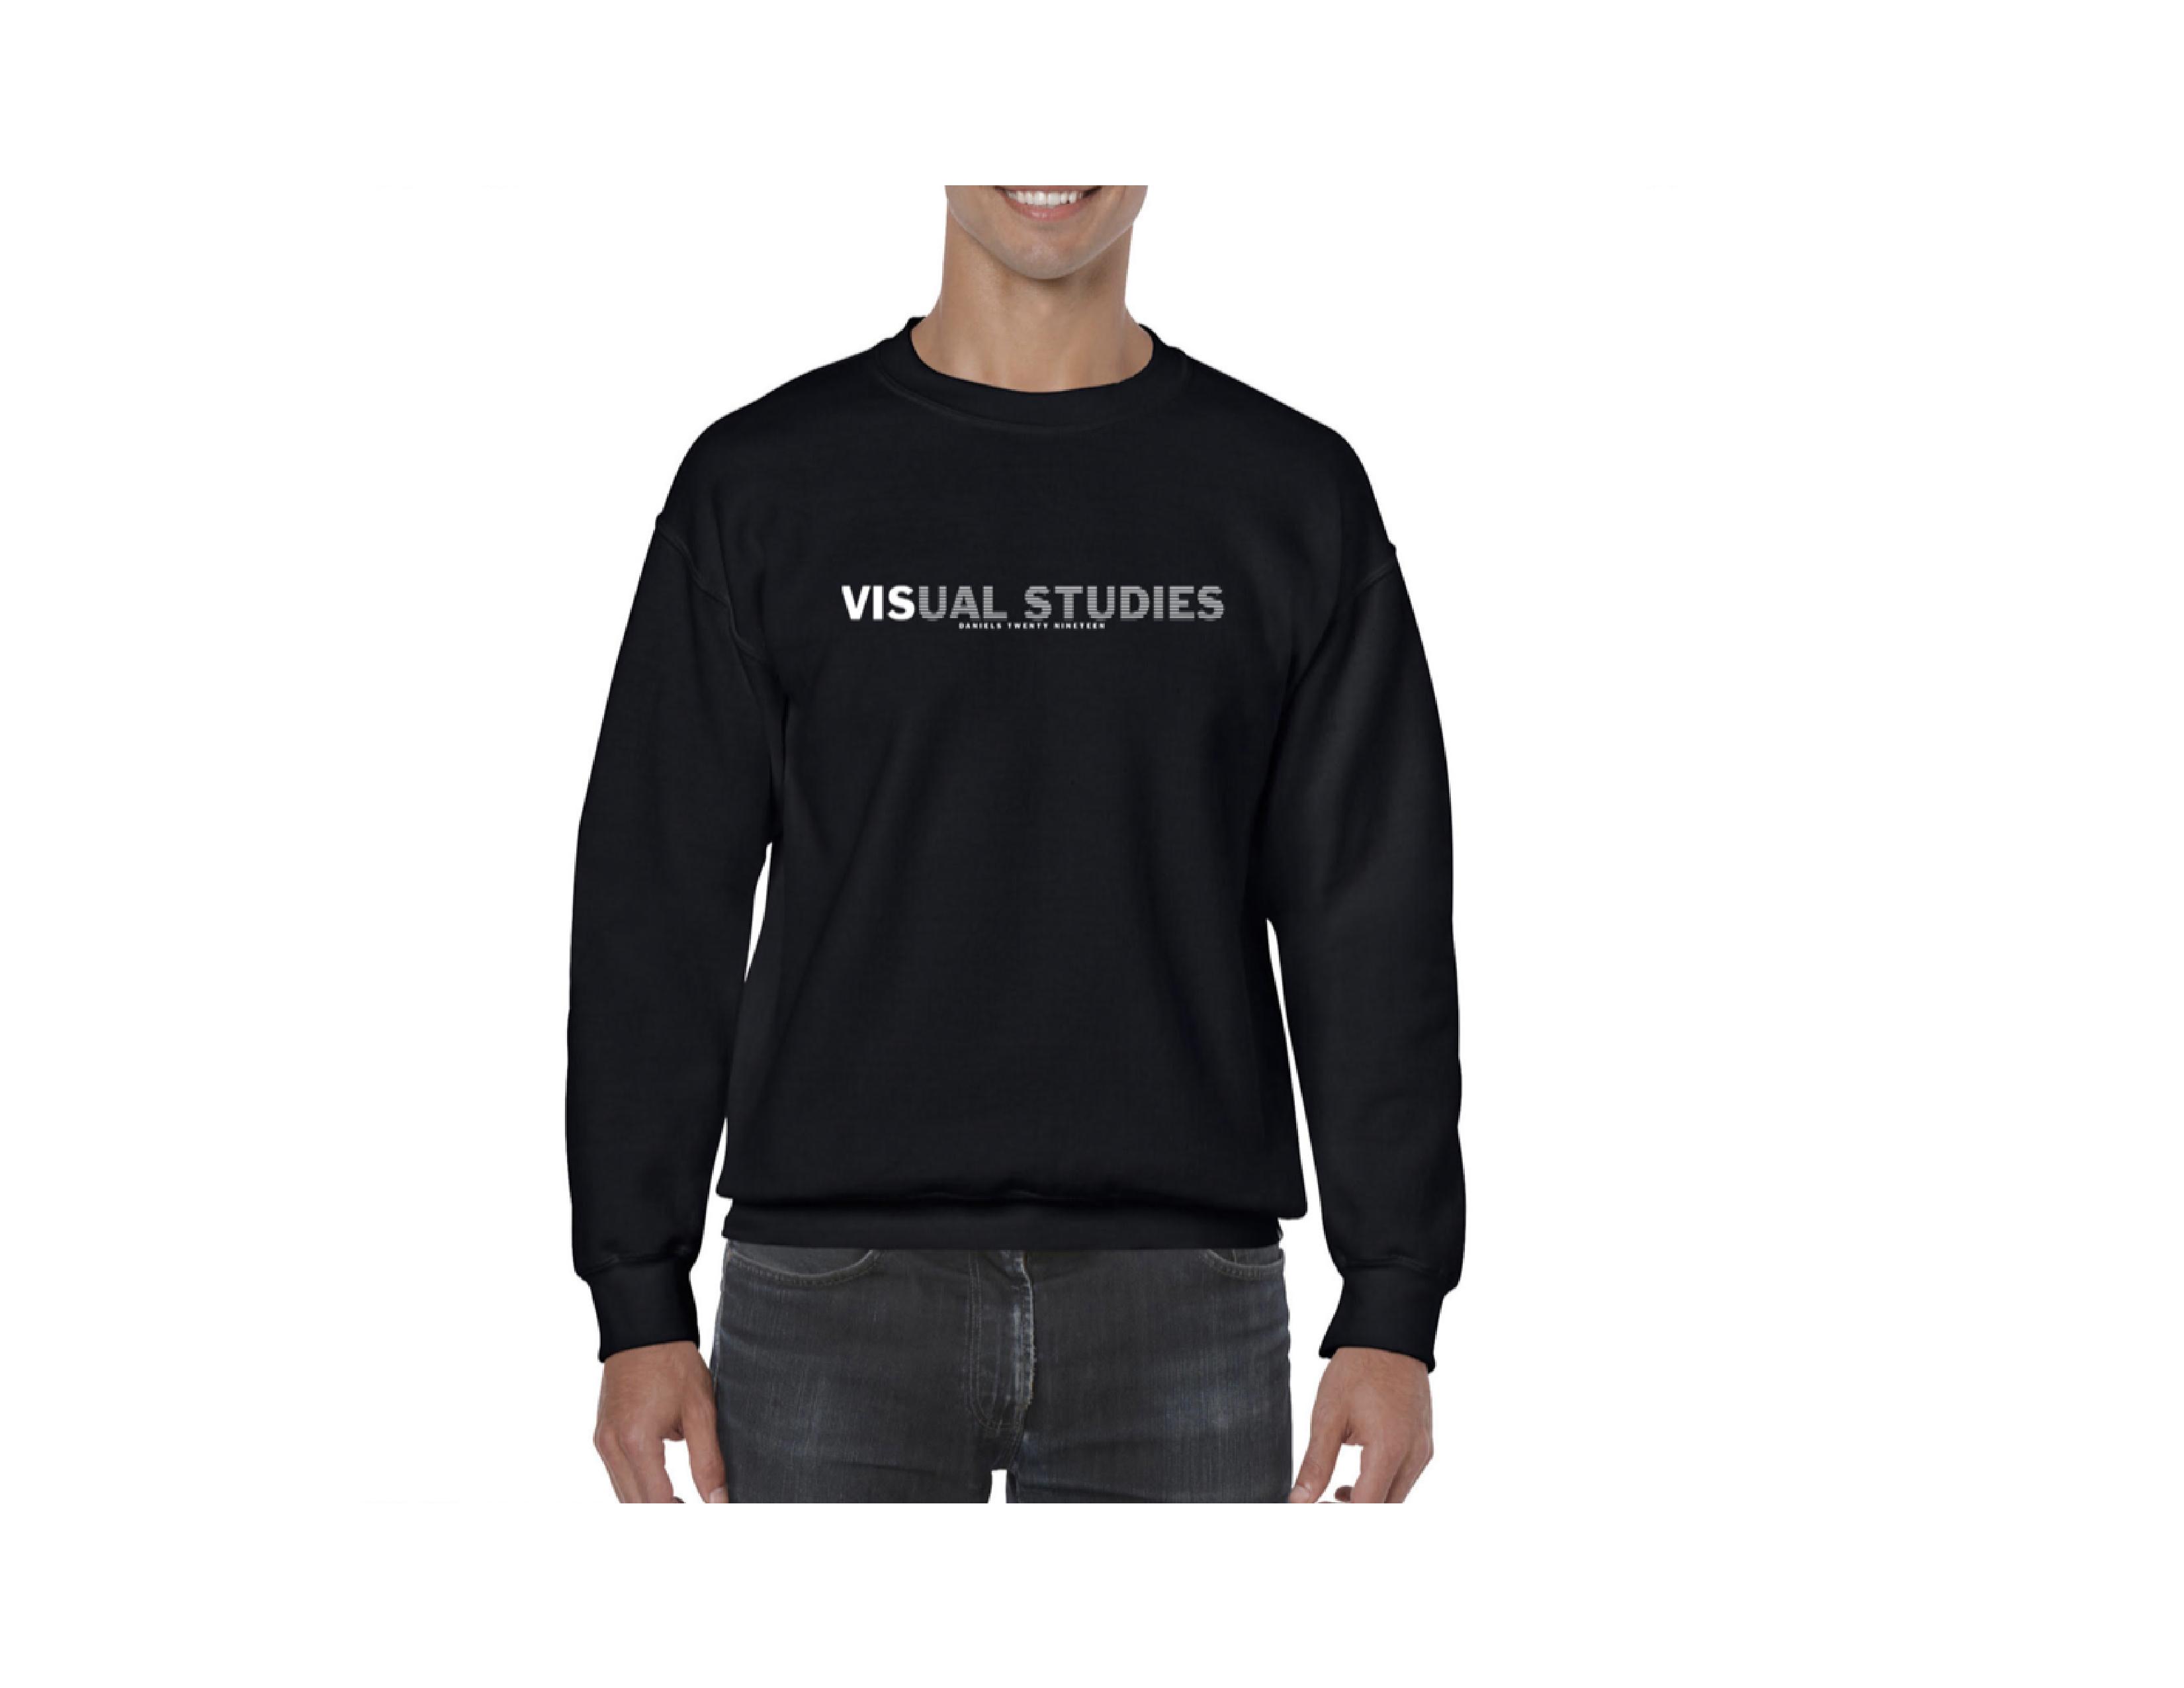 VISUAL STUDIES TWENTY NINETEEN